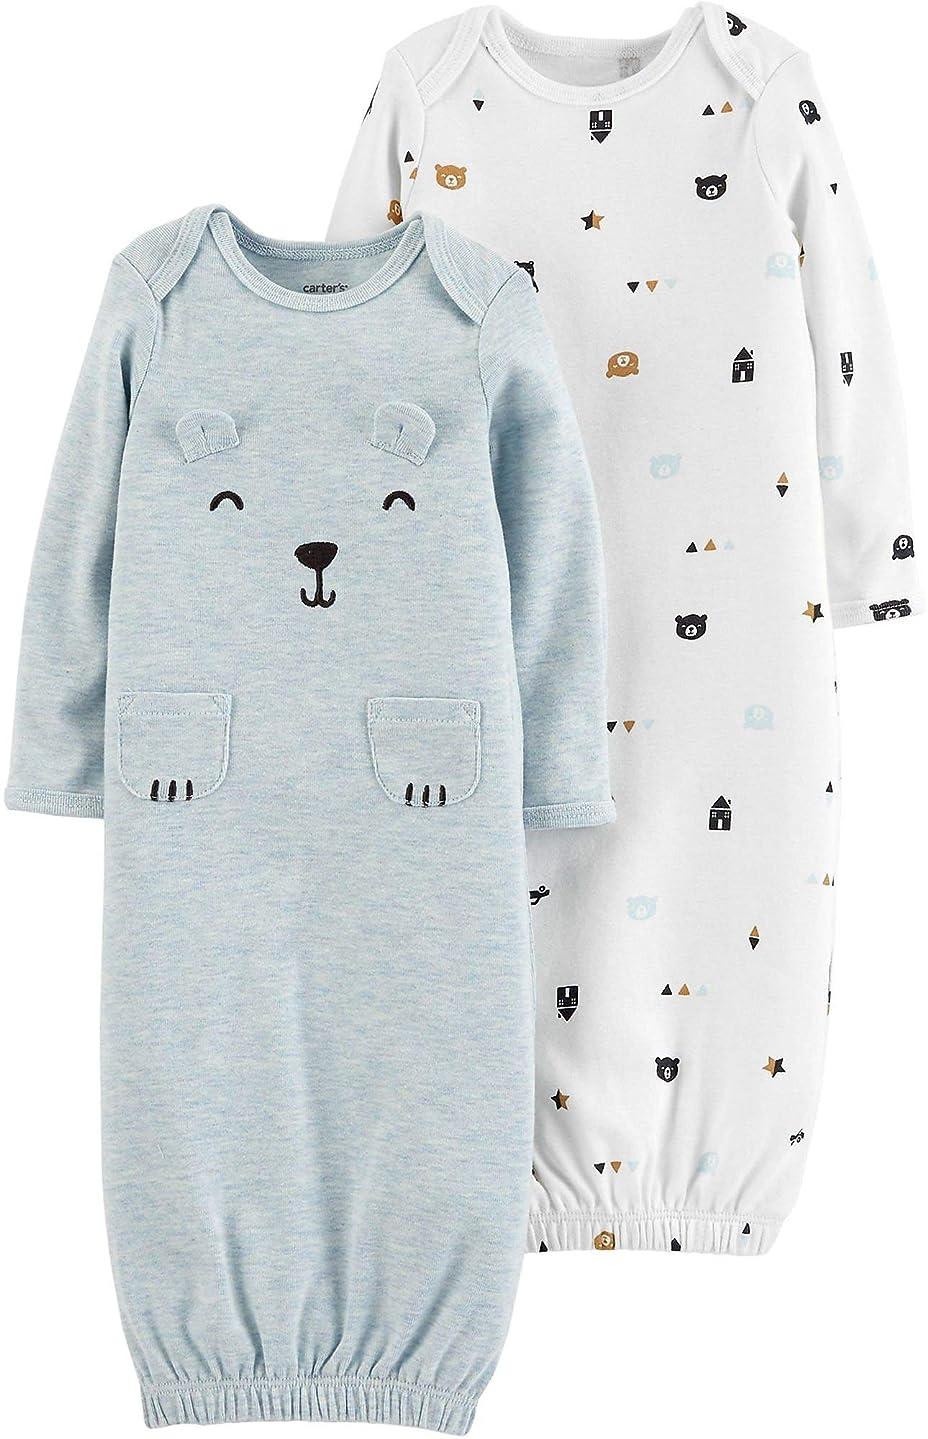 Carter's Baby Boys 2-pk. Bear Sleeper Gowns